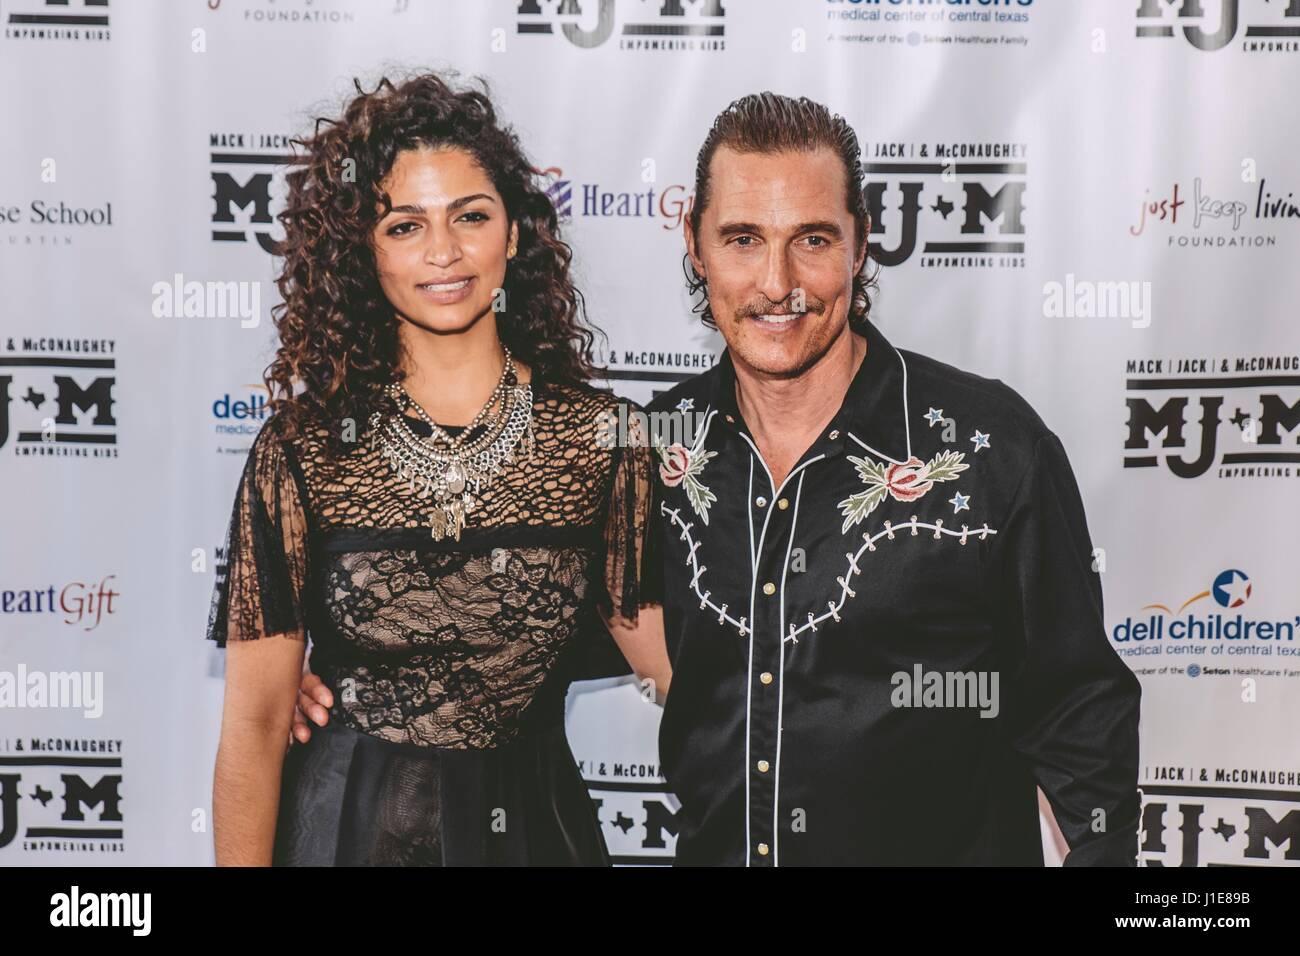 Austin, USA. Apr 20, 2017. Camila Alves, Matthew McConaughey arriver au 2017 Mack, Jack & McConaughey le 20 Photo Stock